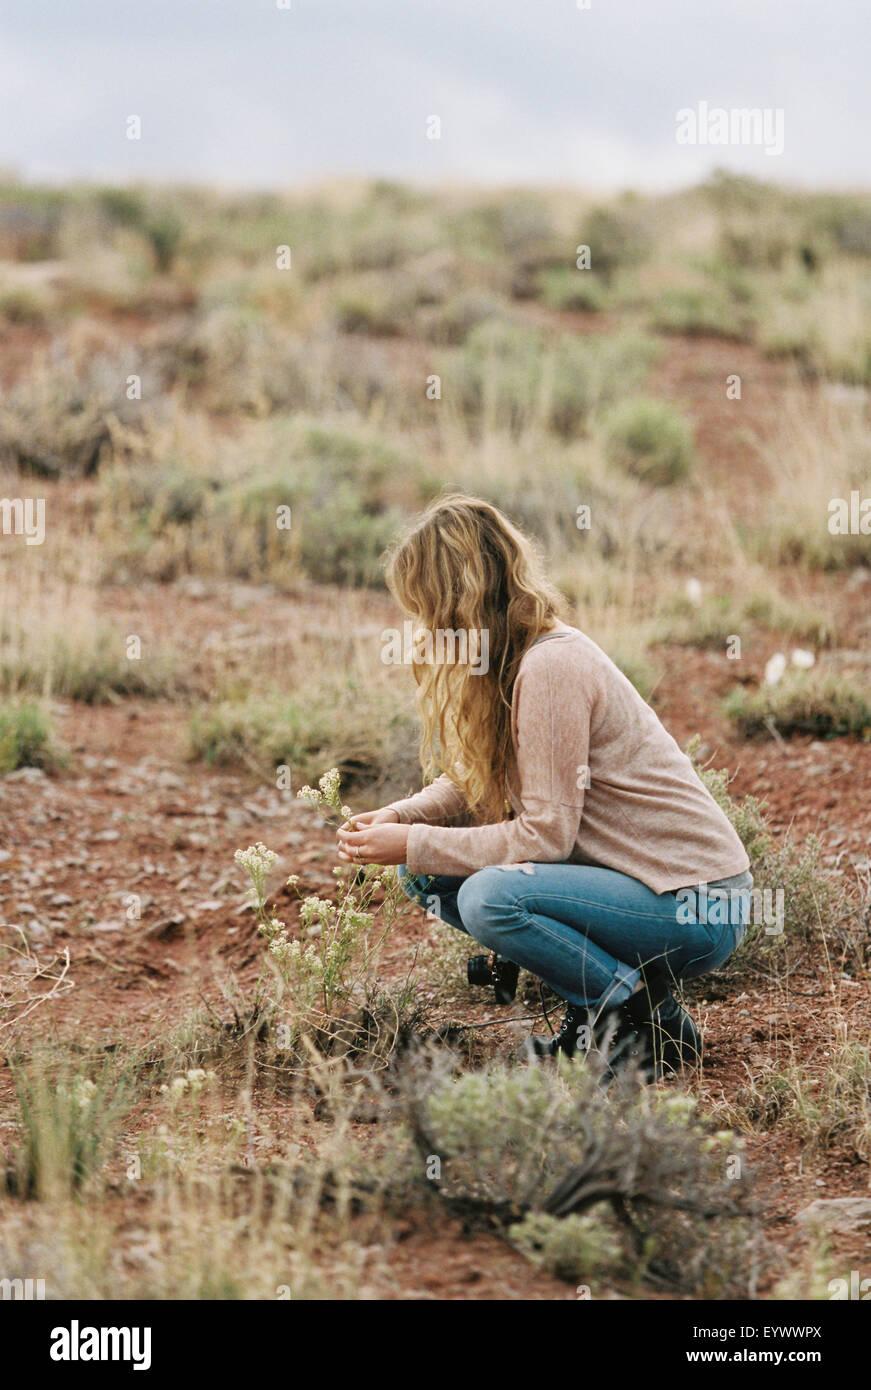 Woman kneeling in a desert, picking wild flowers. - Stock Image